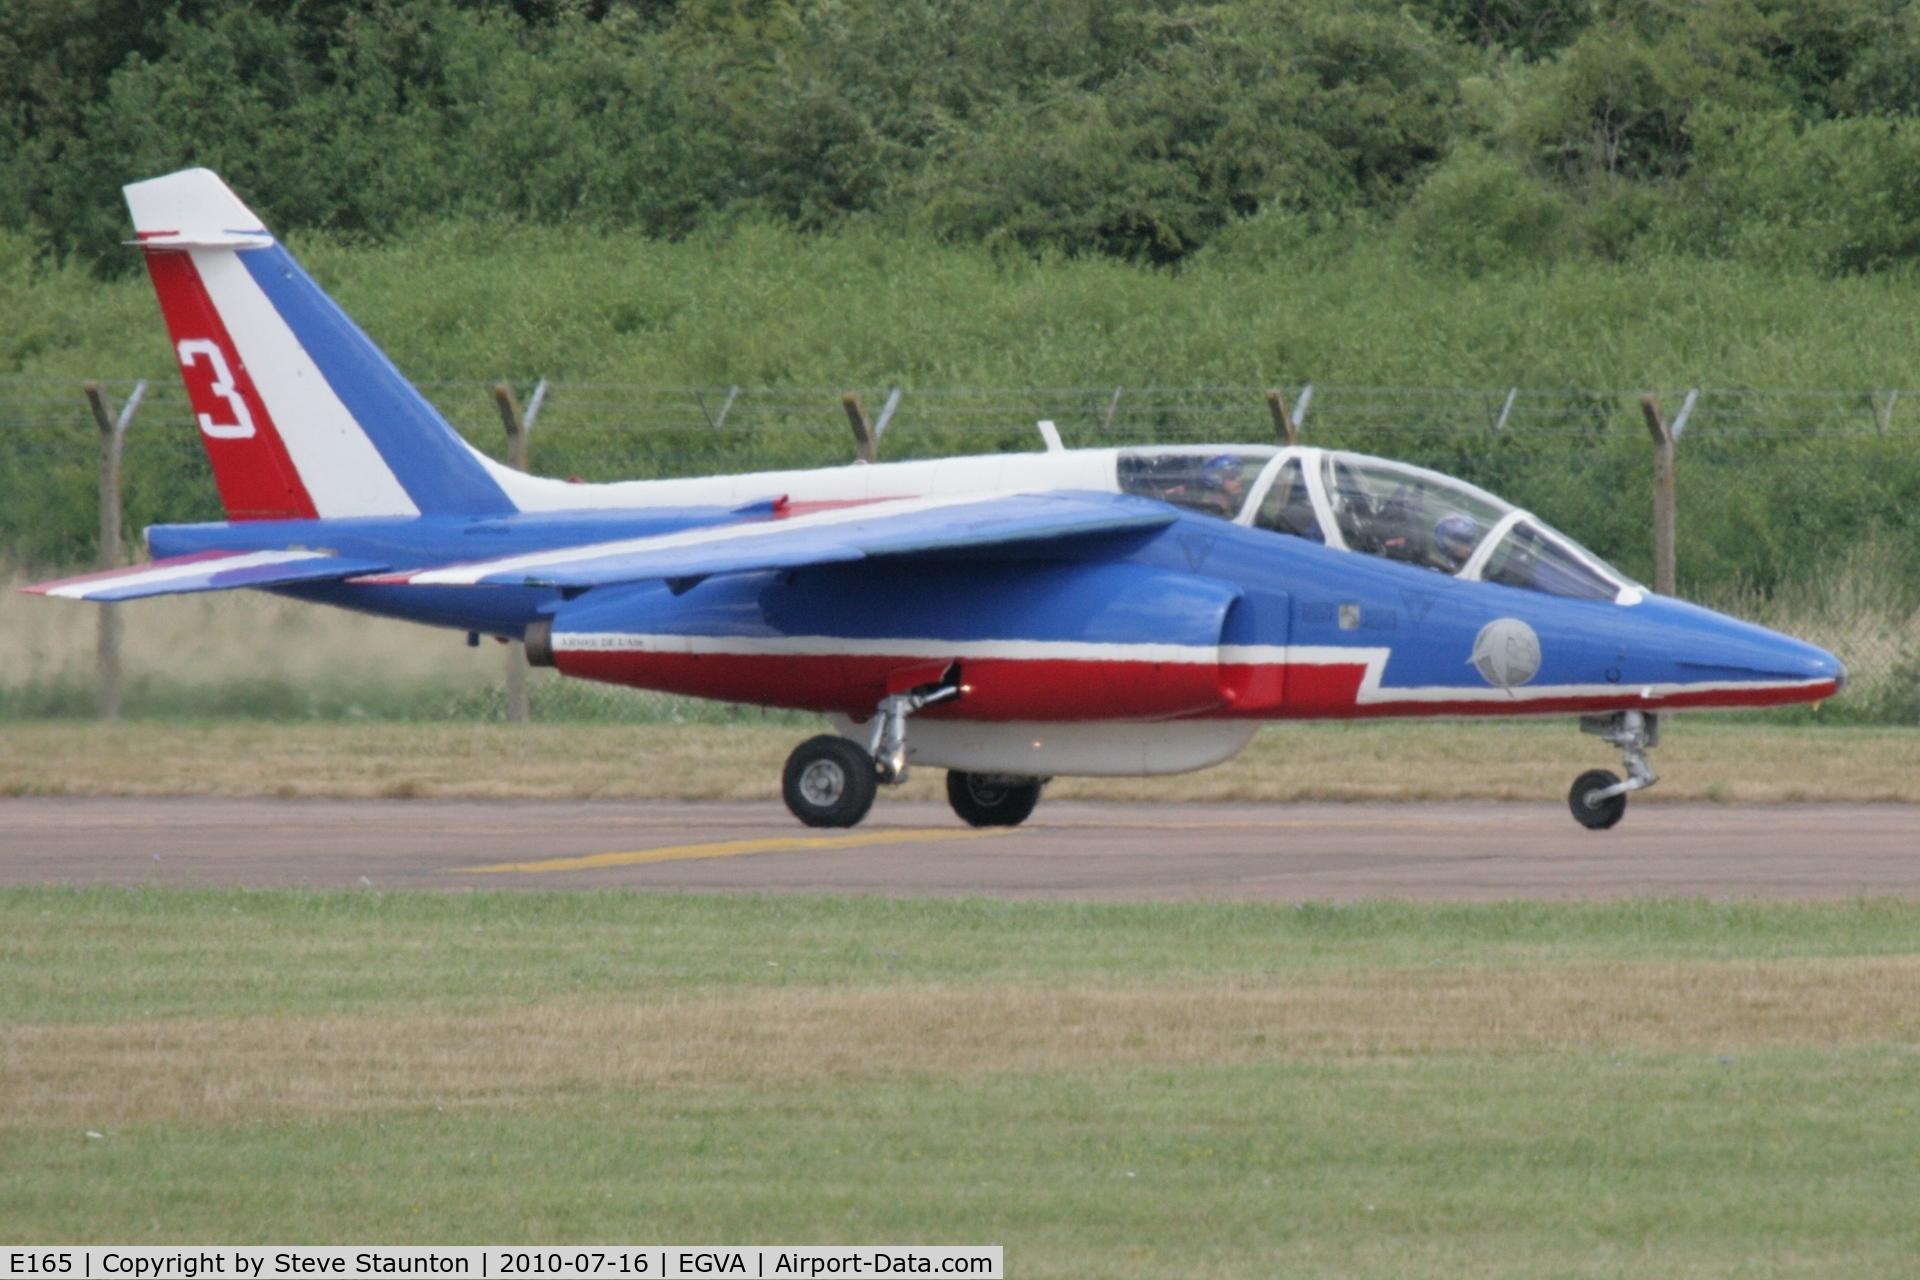 E165, Dassault-Dornier Alpha Jet E C/N E165, Taken at the Royal International Air Tattoo 2010